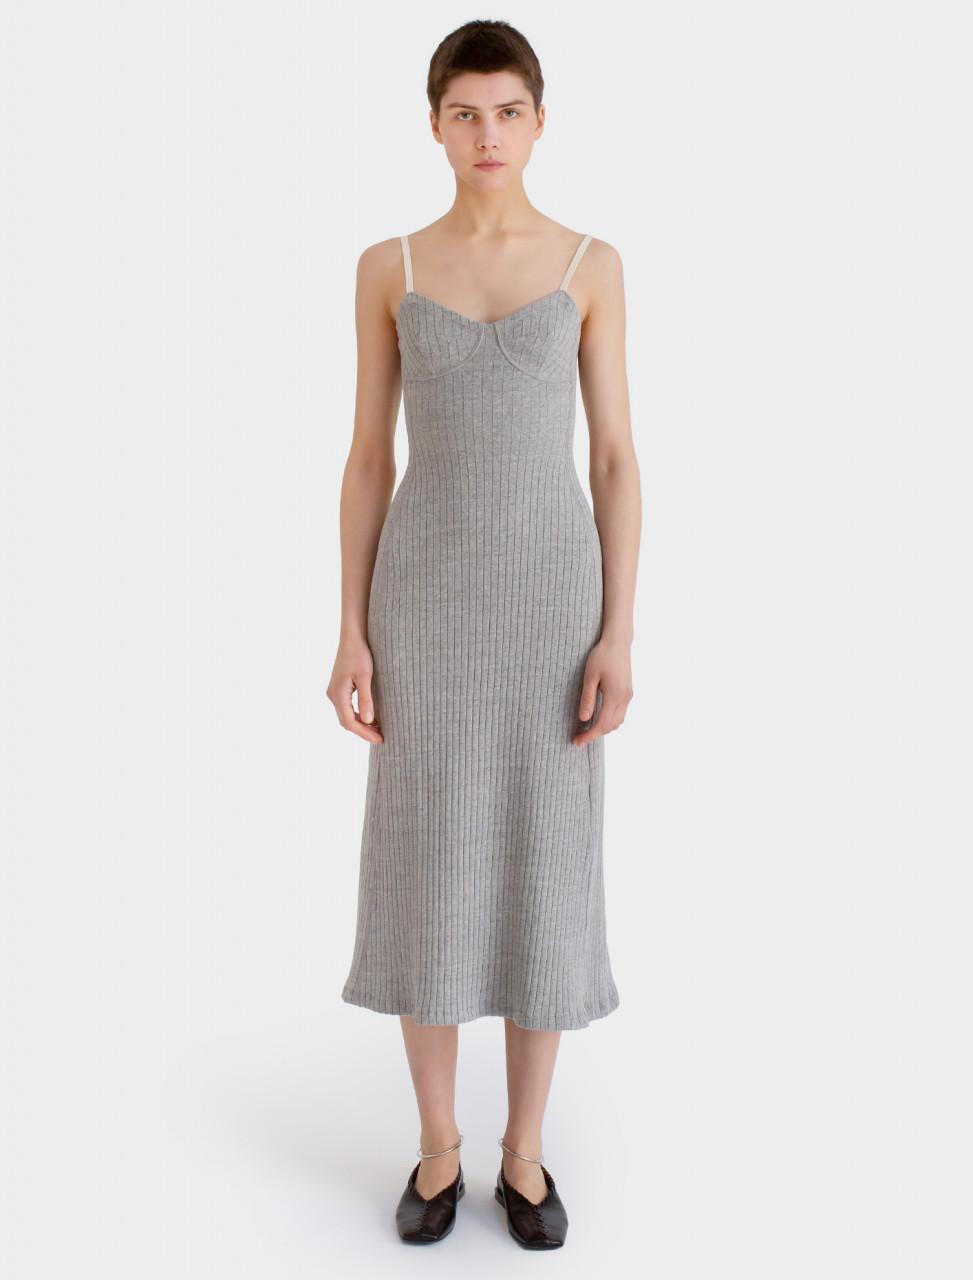 Cotton Jersey Dress in Light Grey